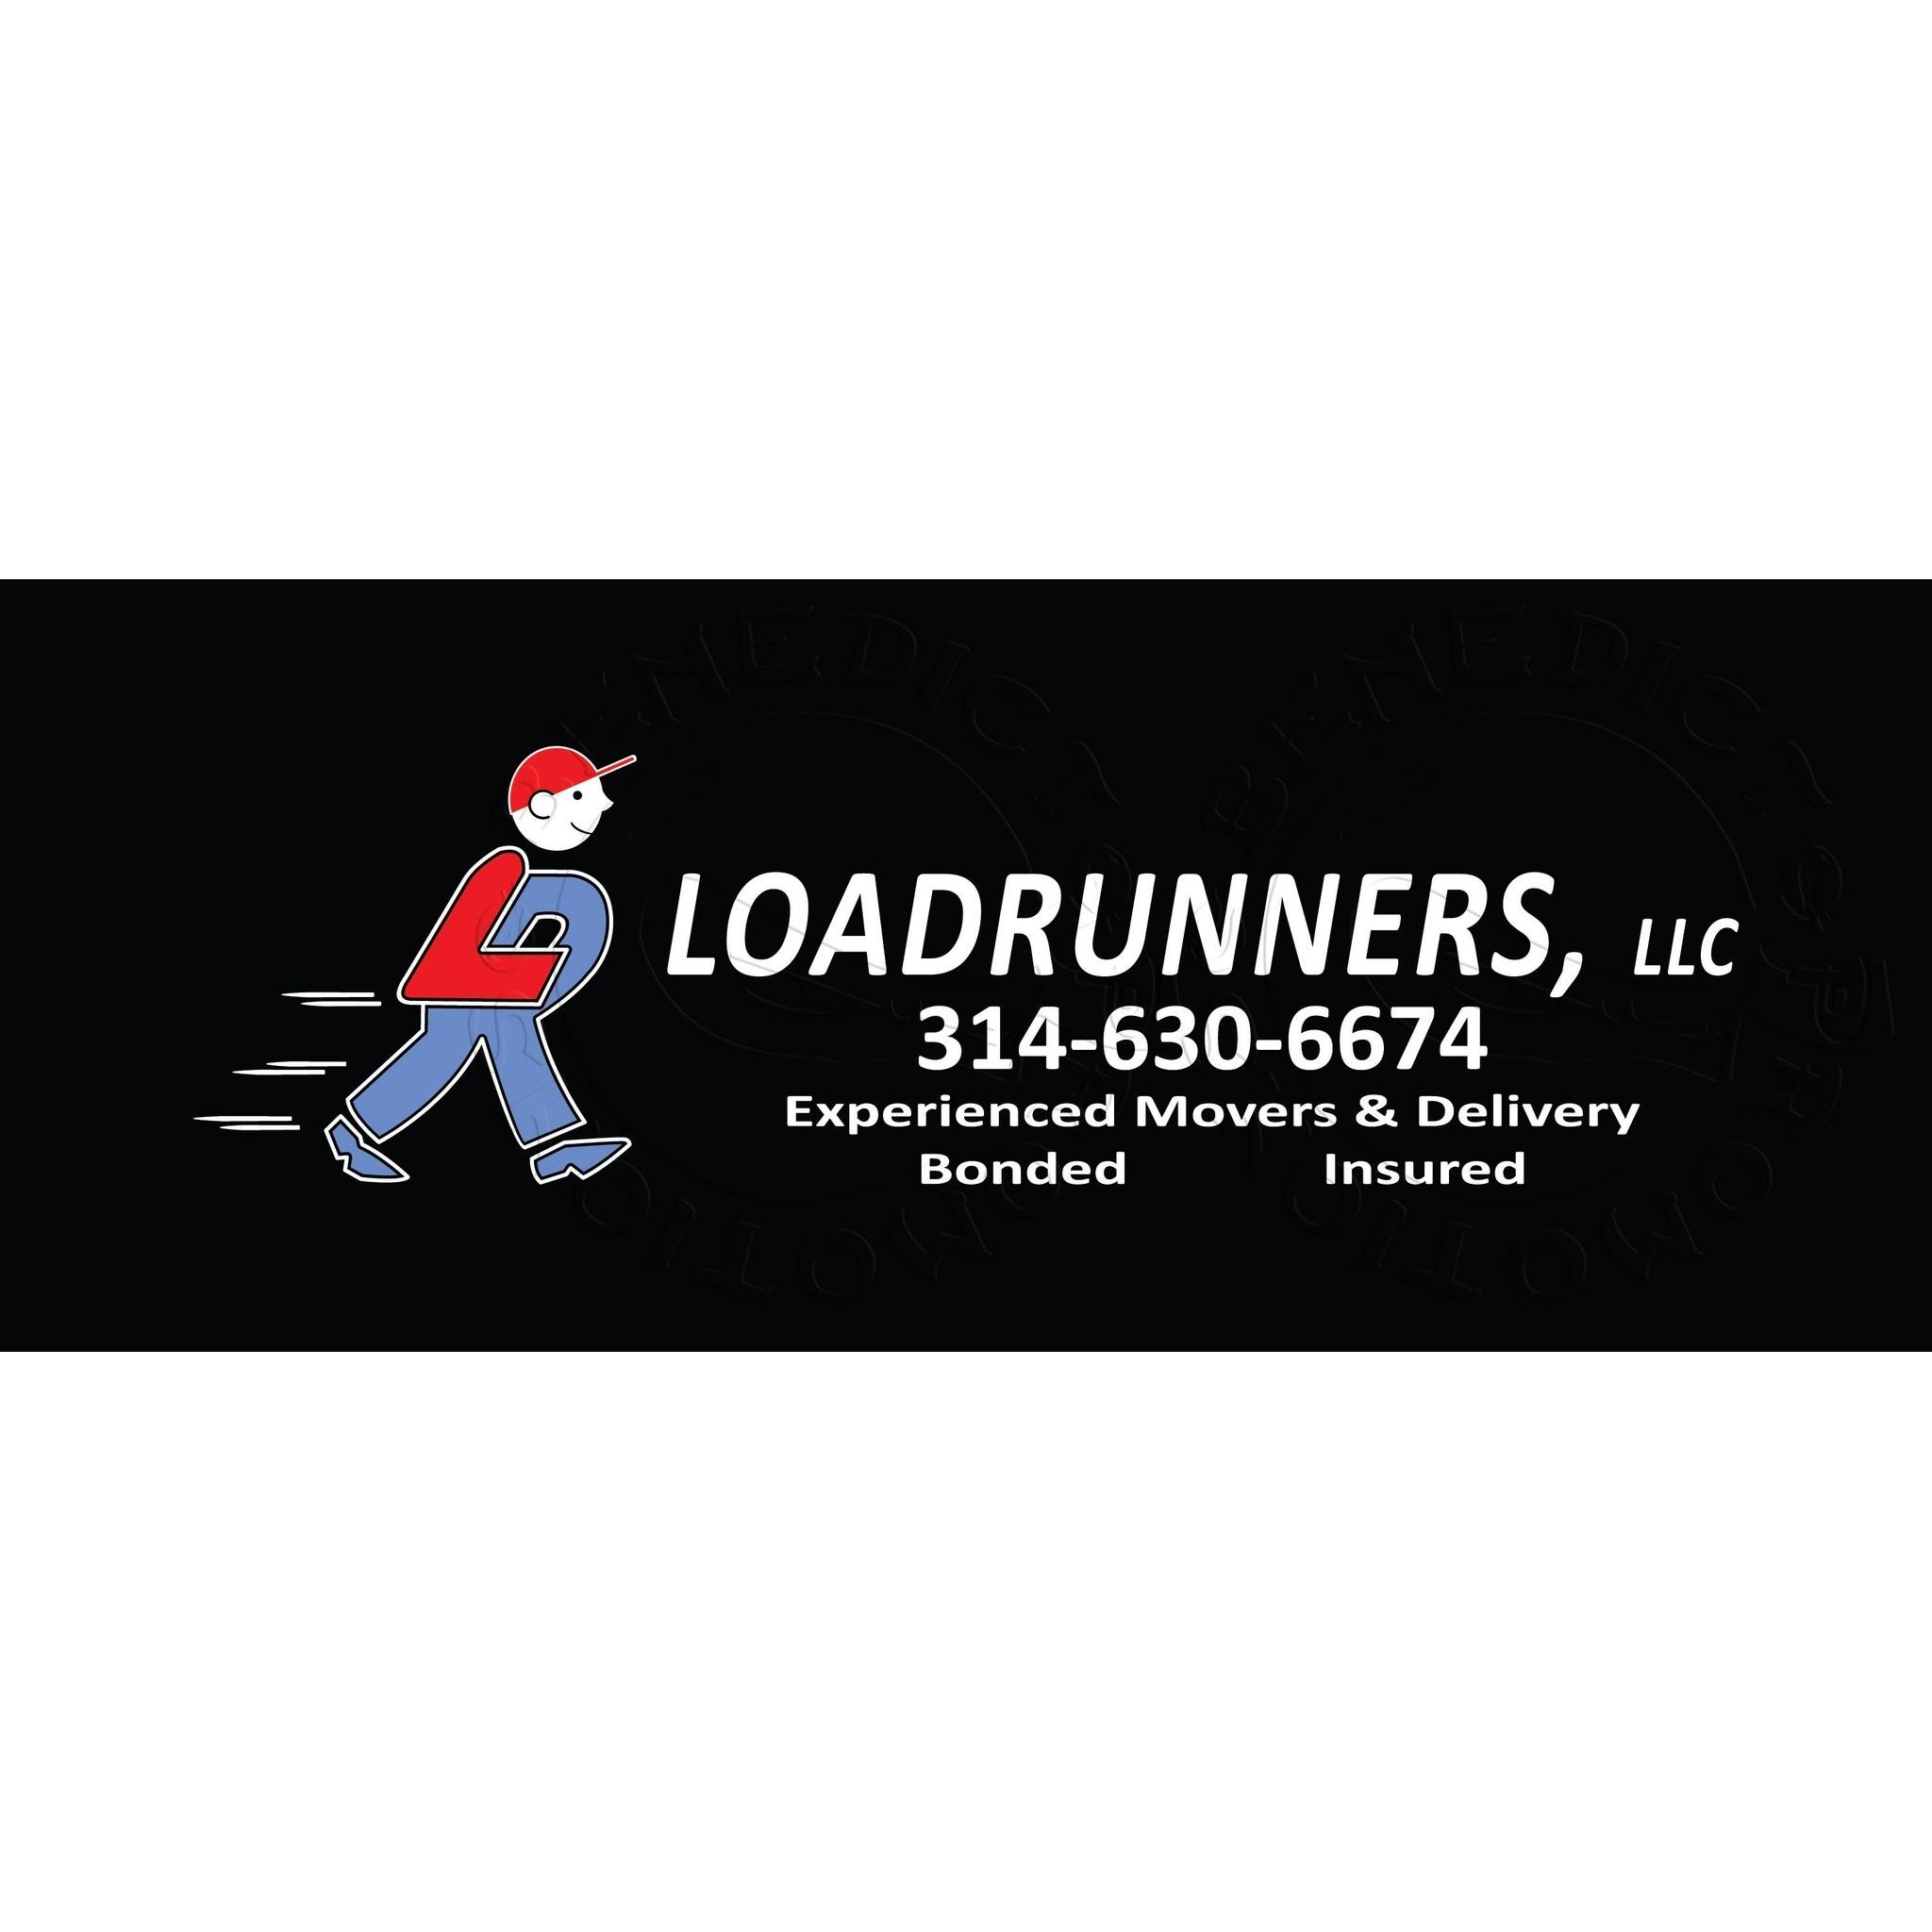 Loadrunners, LLC. image 2